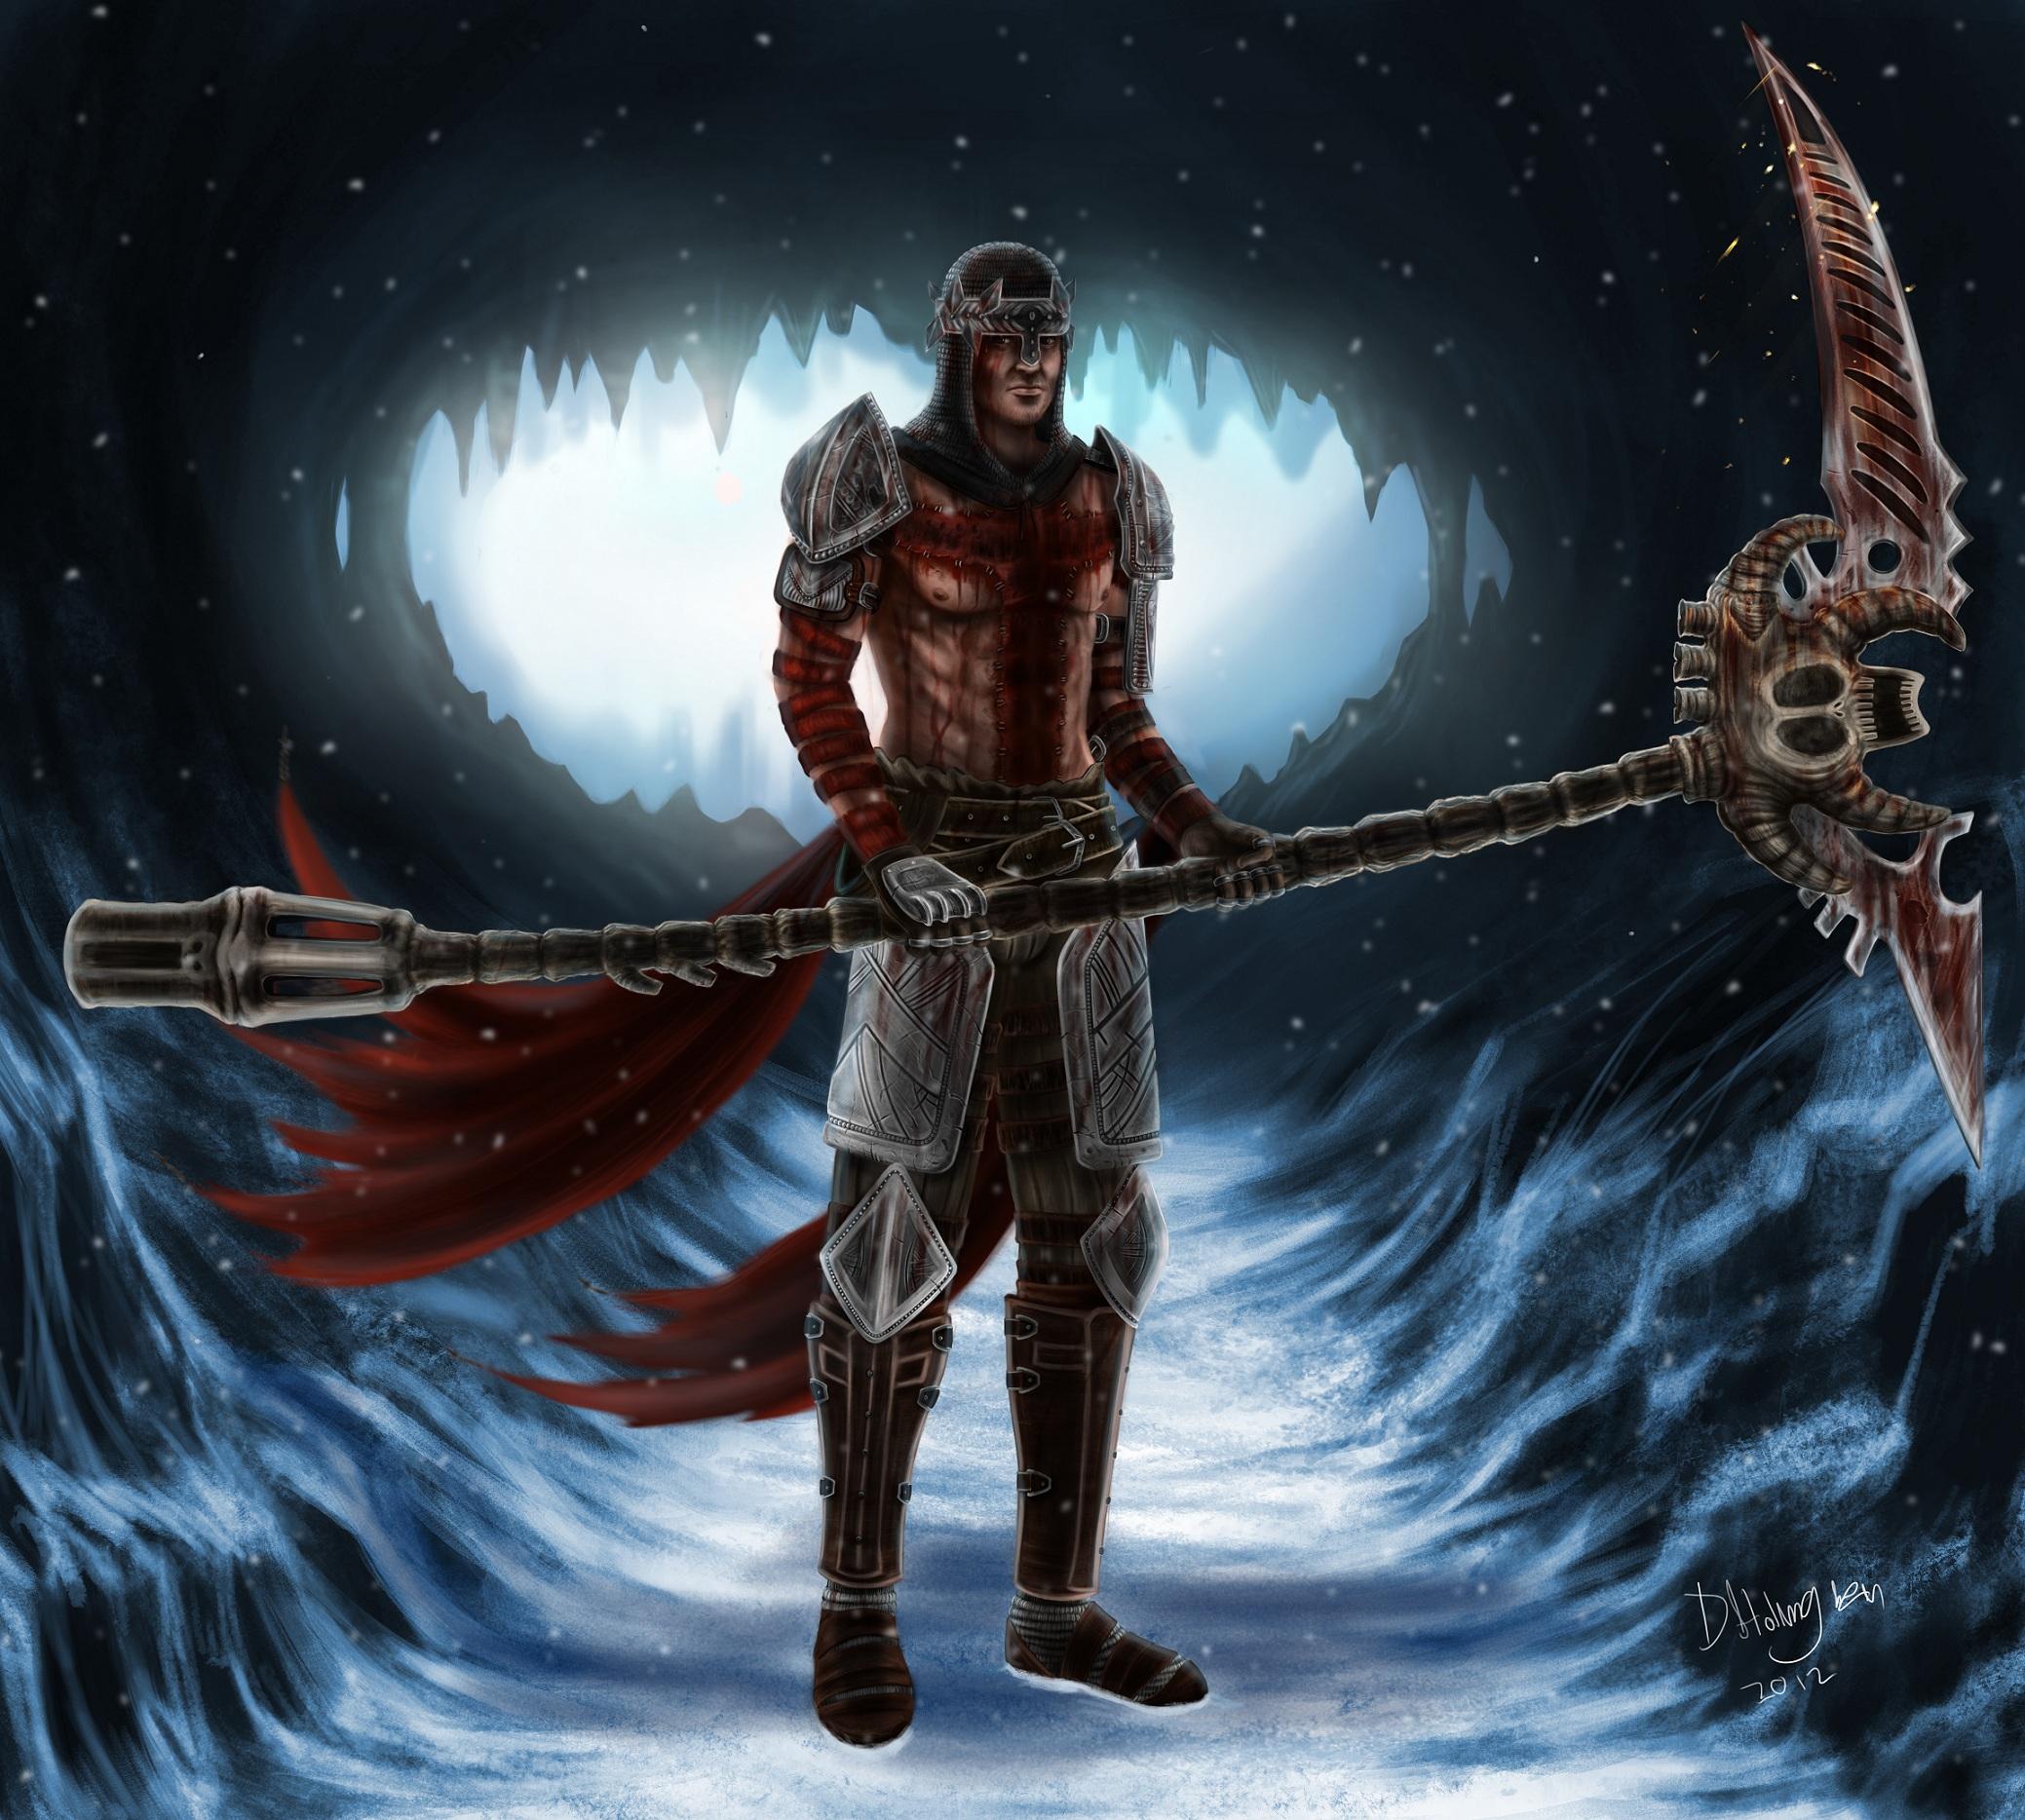 Dante S Inferno Fanart Image Concept Artists Mod Db